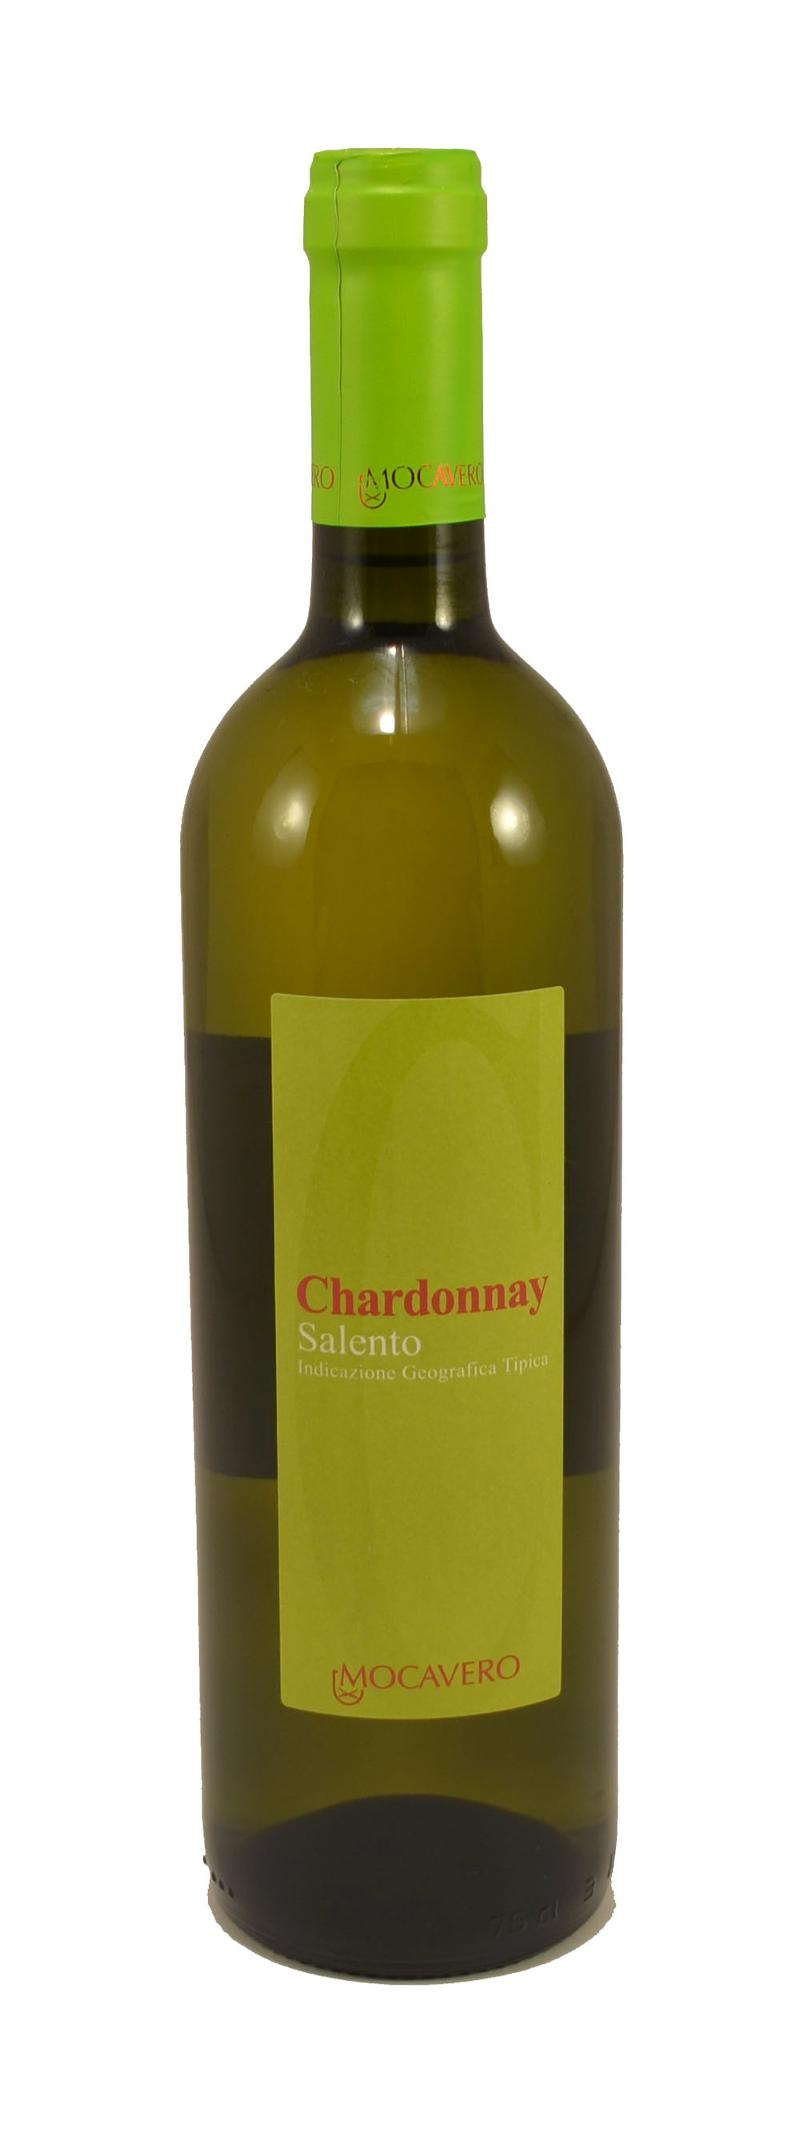 mocavero chardonnay